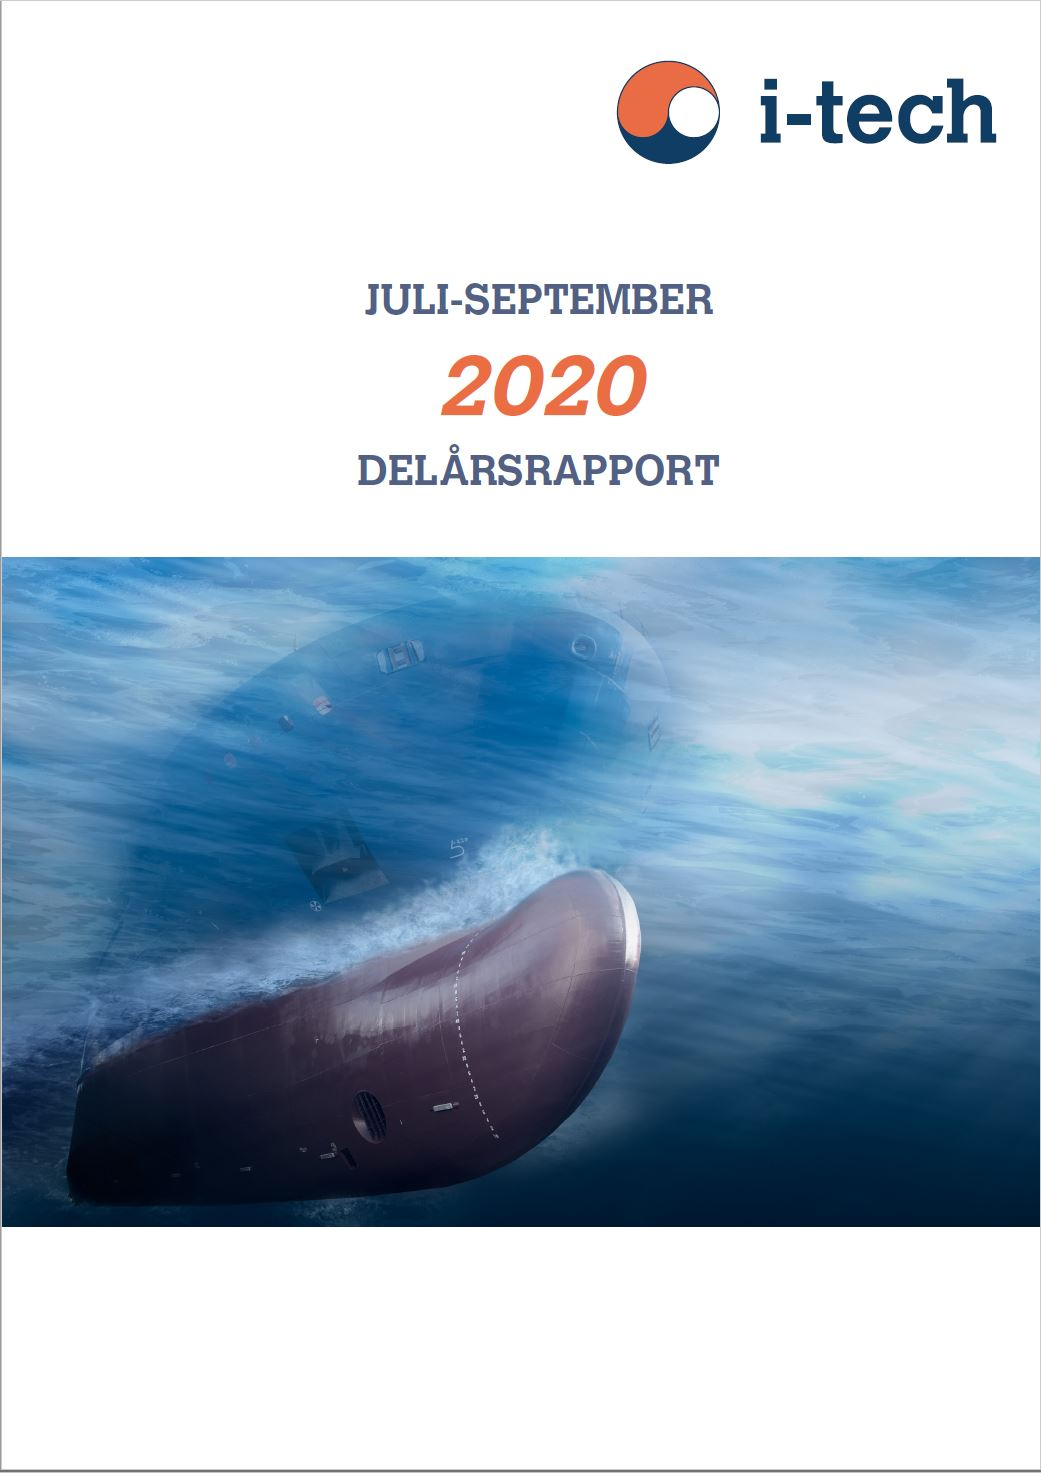 2020 Q3